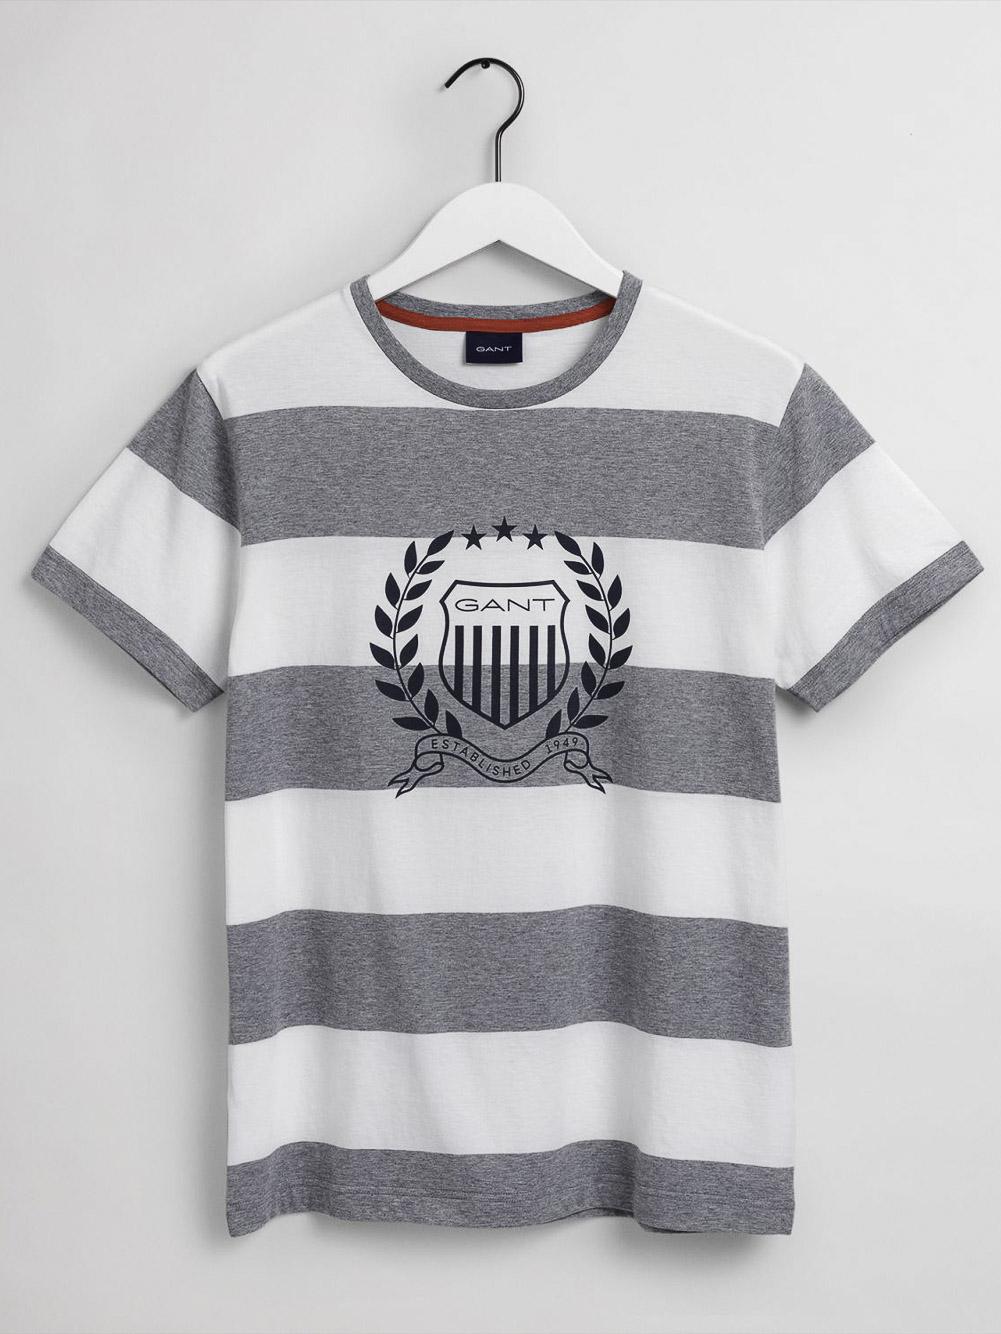 GANT Mπλούζα t-shirt 3G2003098-93 ΓΚΡΙ